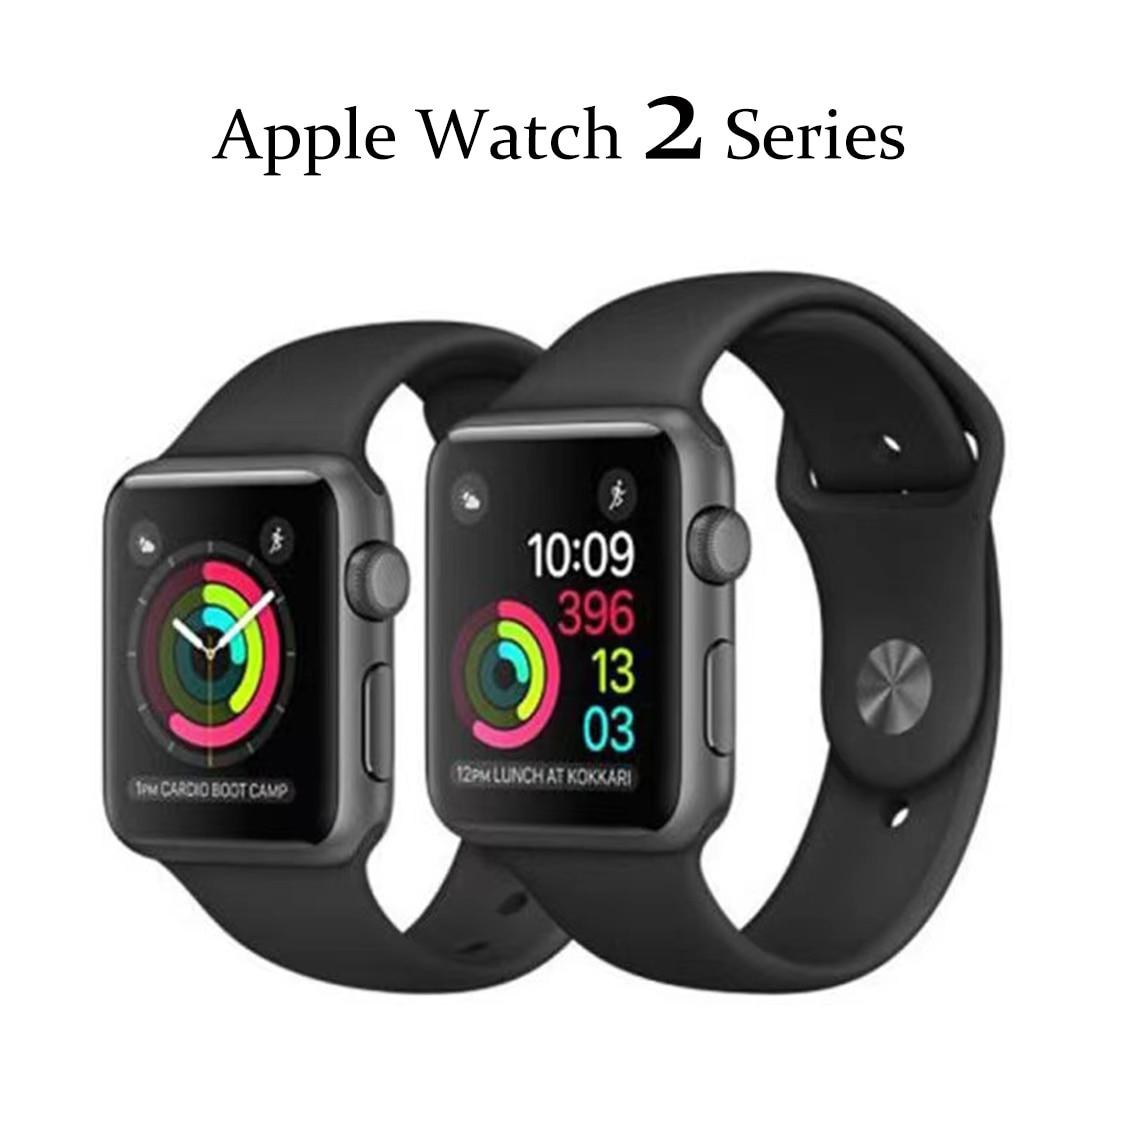 Apple Watch Series 2 GPS 38 مللي متر/42 مللي متر أصلي مستعمل 90% جديد أبيض وأسود حاوية من الفولاذ المقاوم للصدأ الرياضة الفرقة Smartwatch